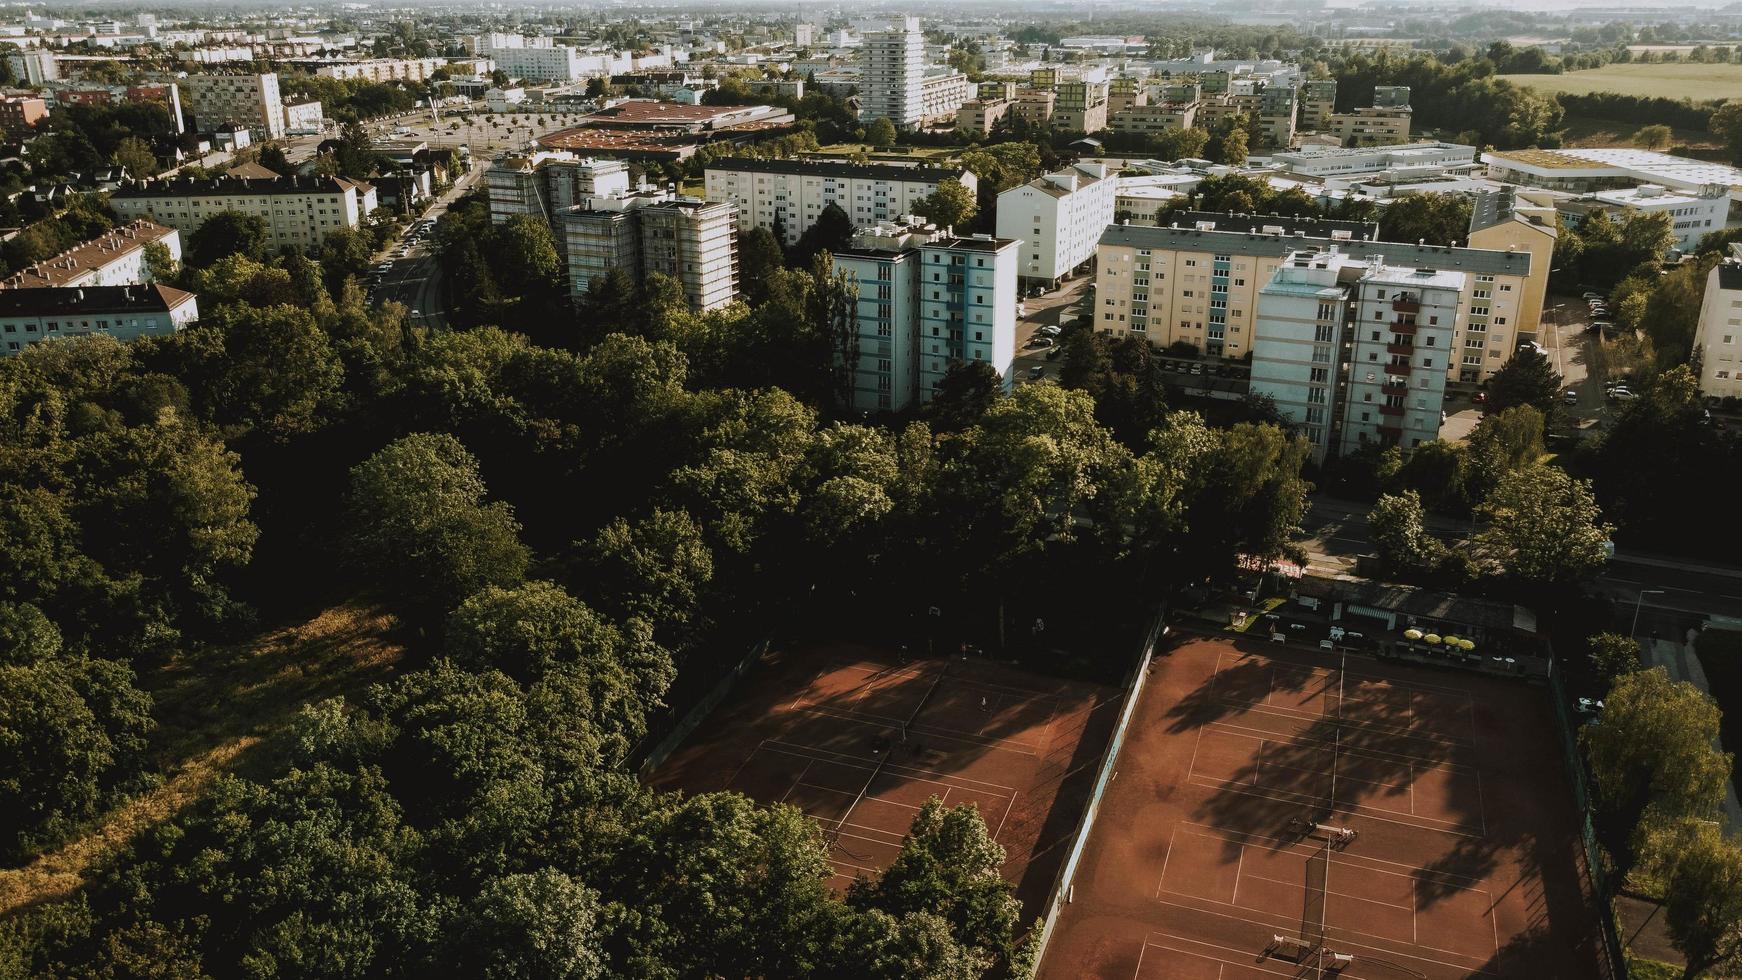 Flygfoto över staden foto